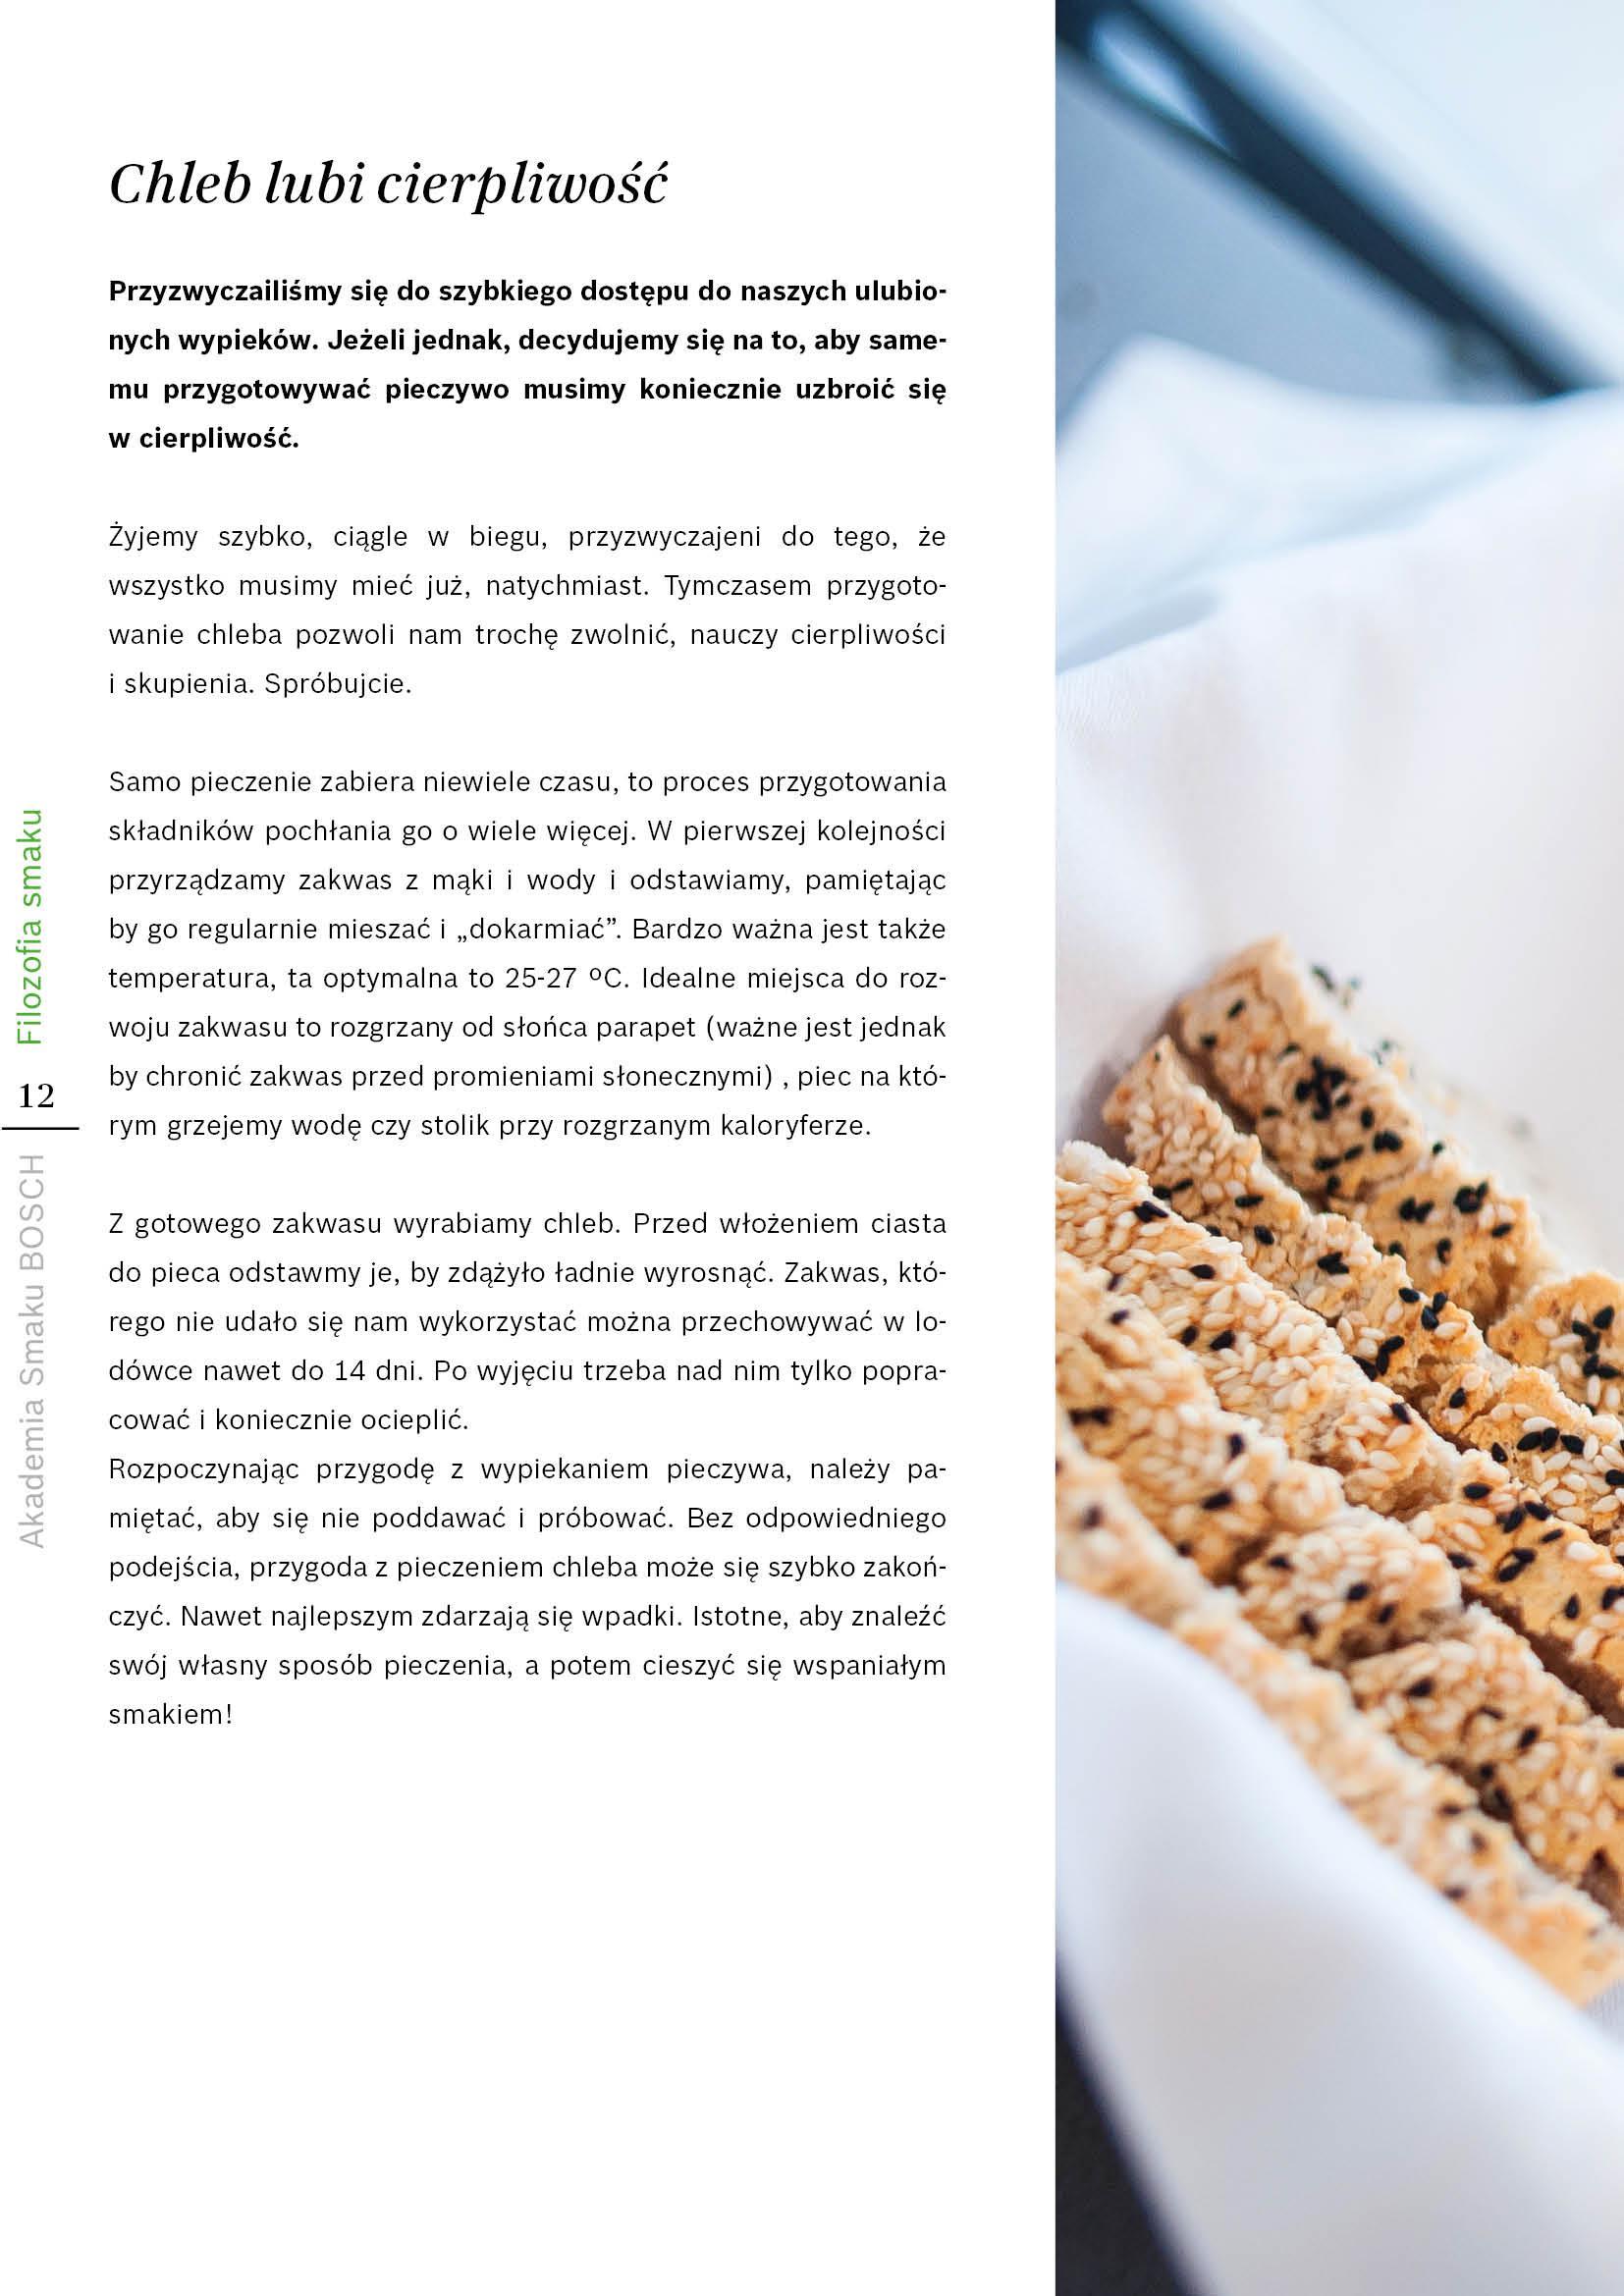 Chlebem i solą - Strona 12